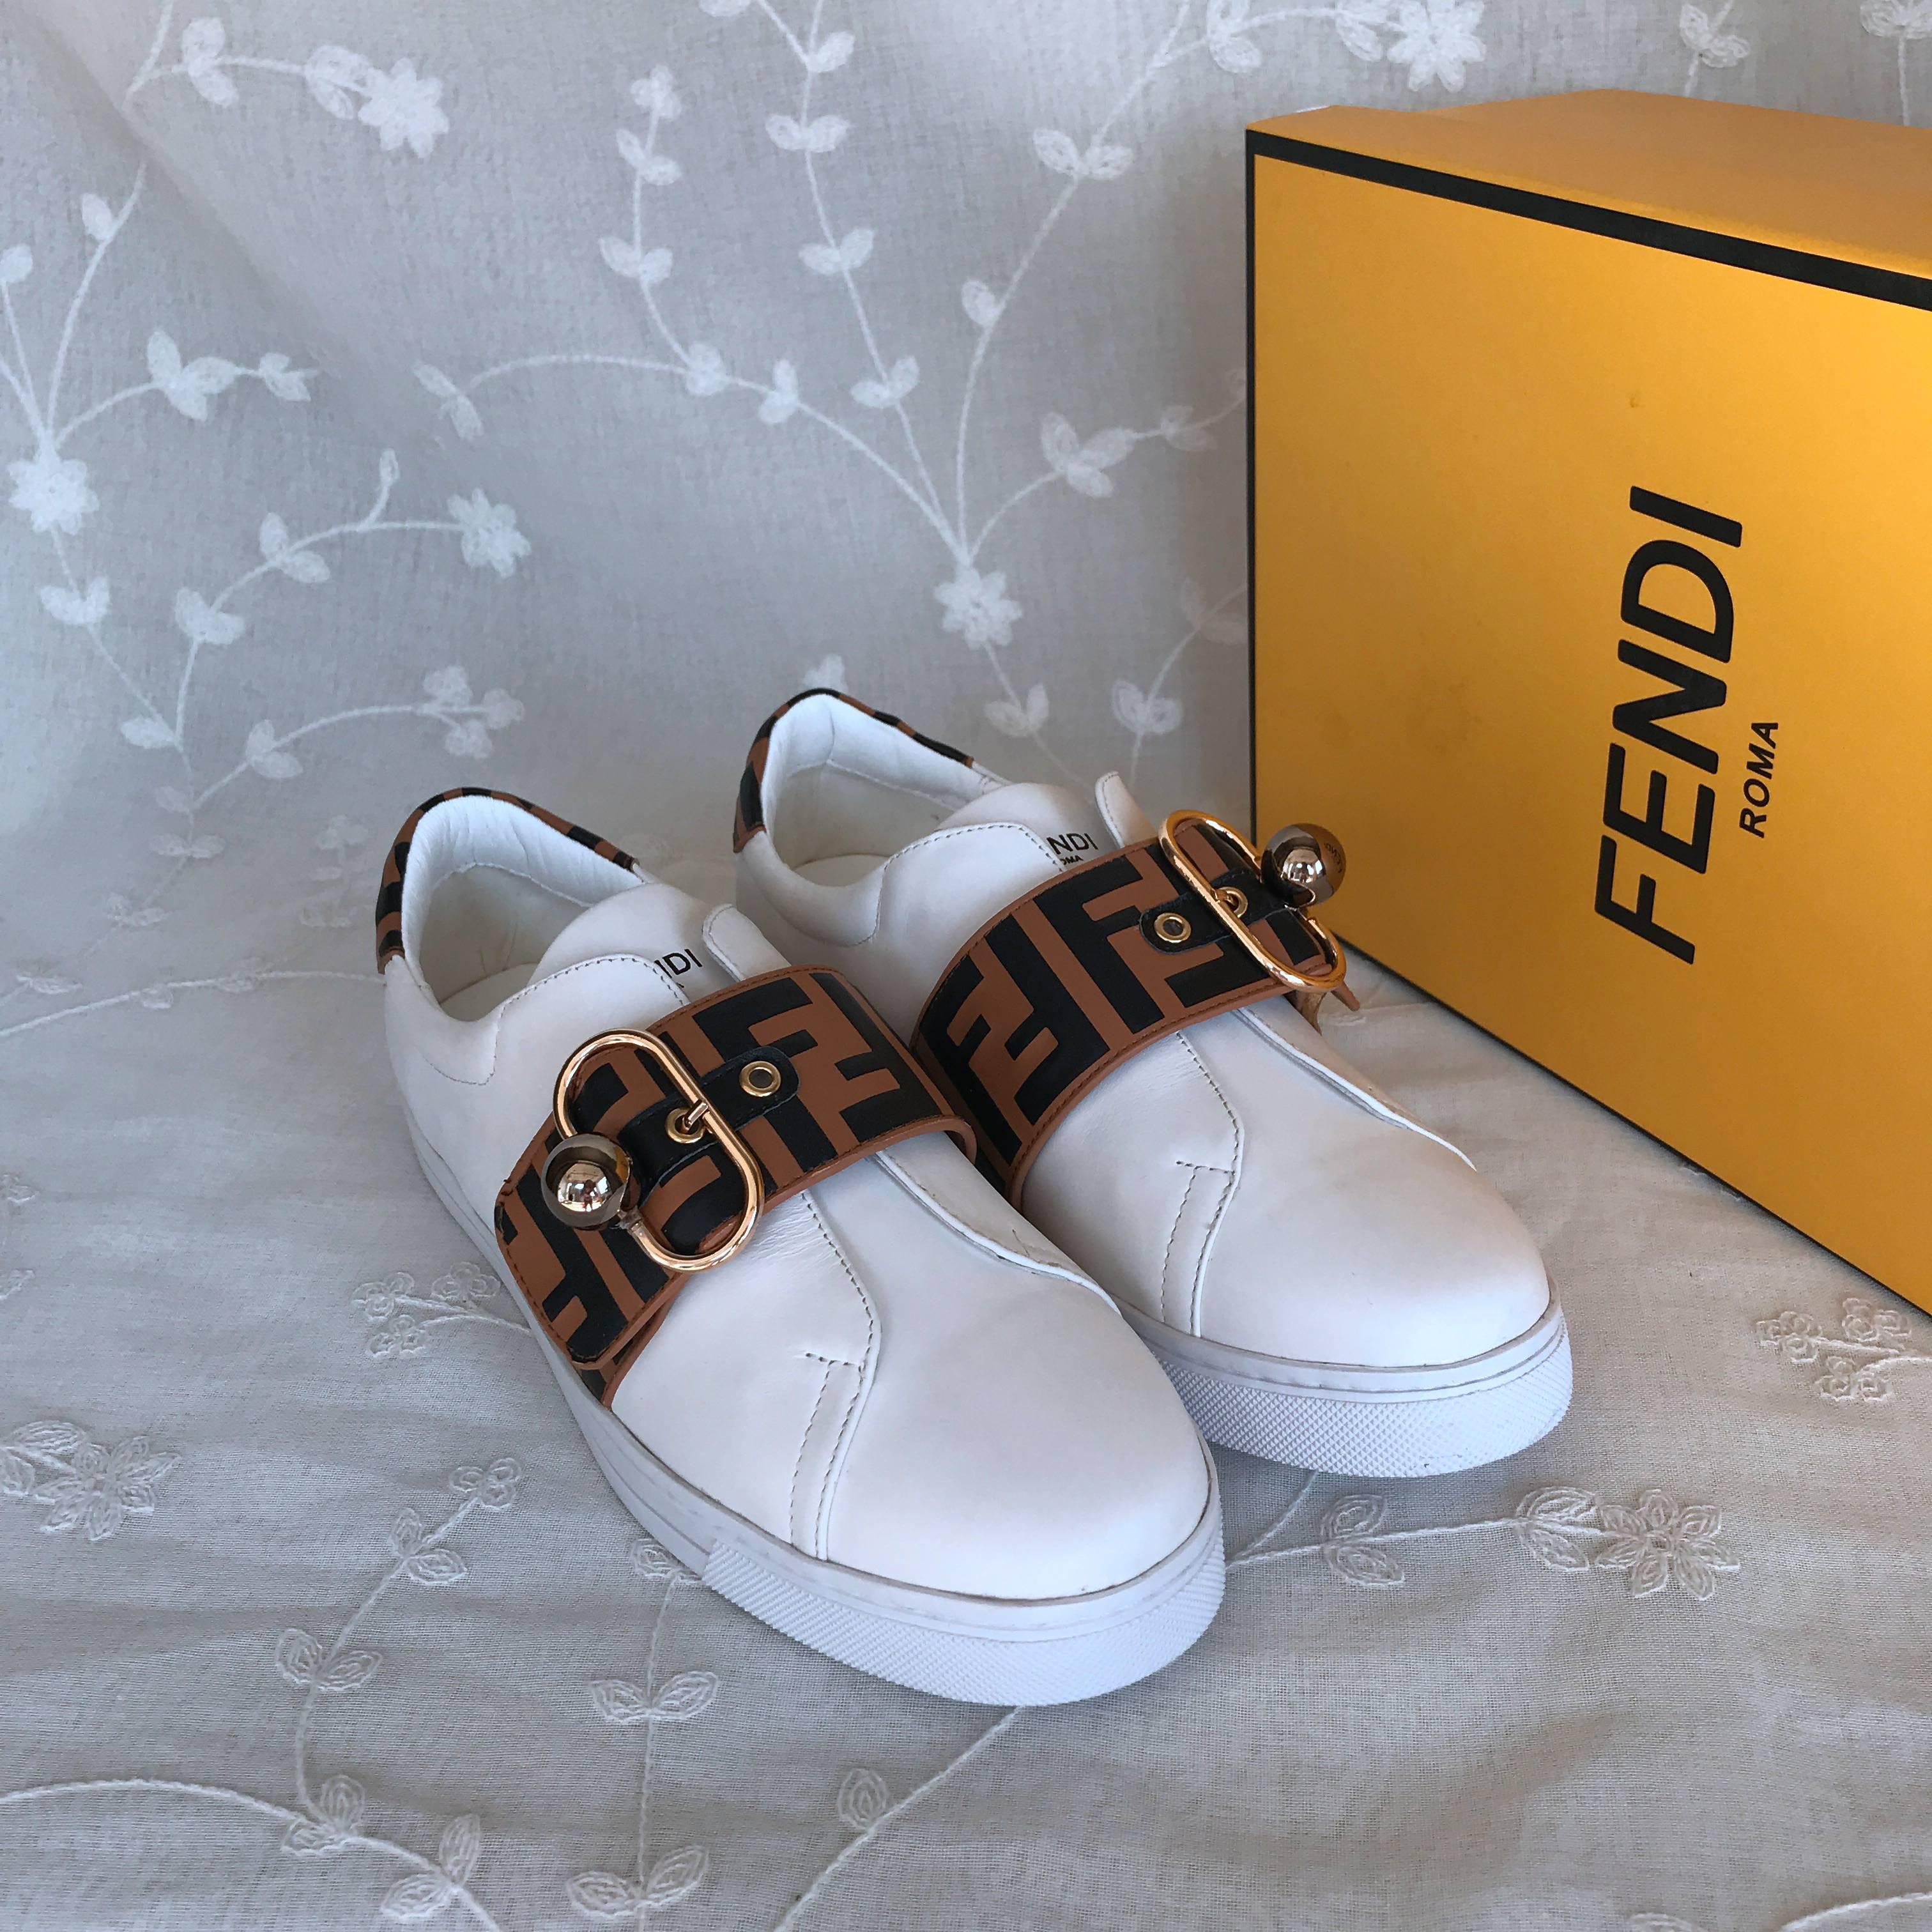 Fendi Casual Shoes 842713